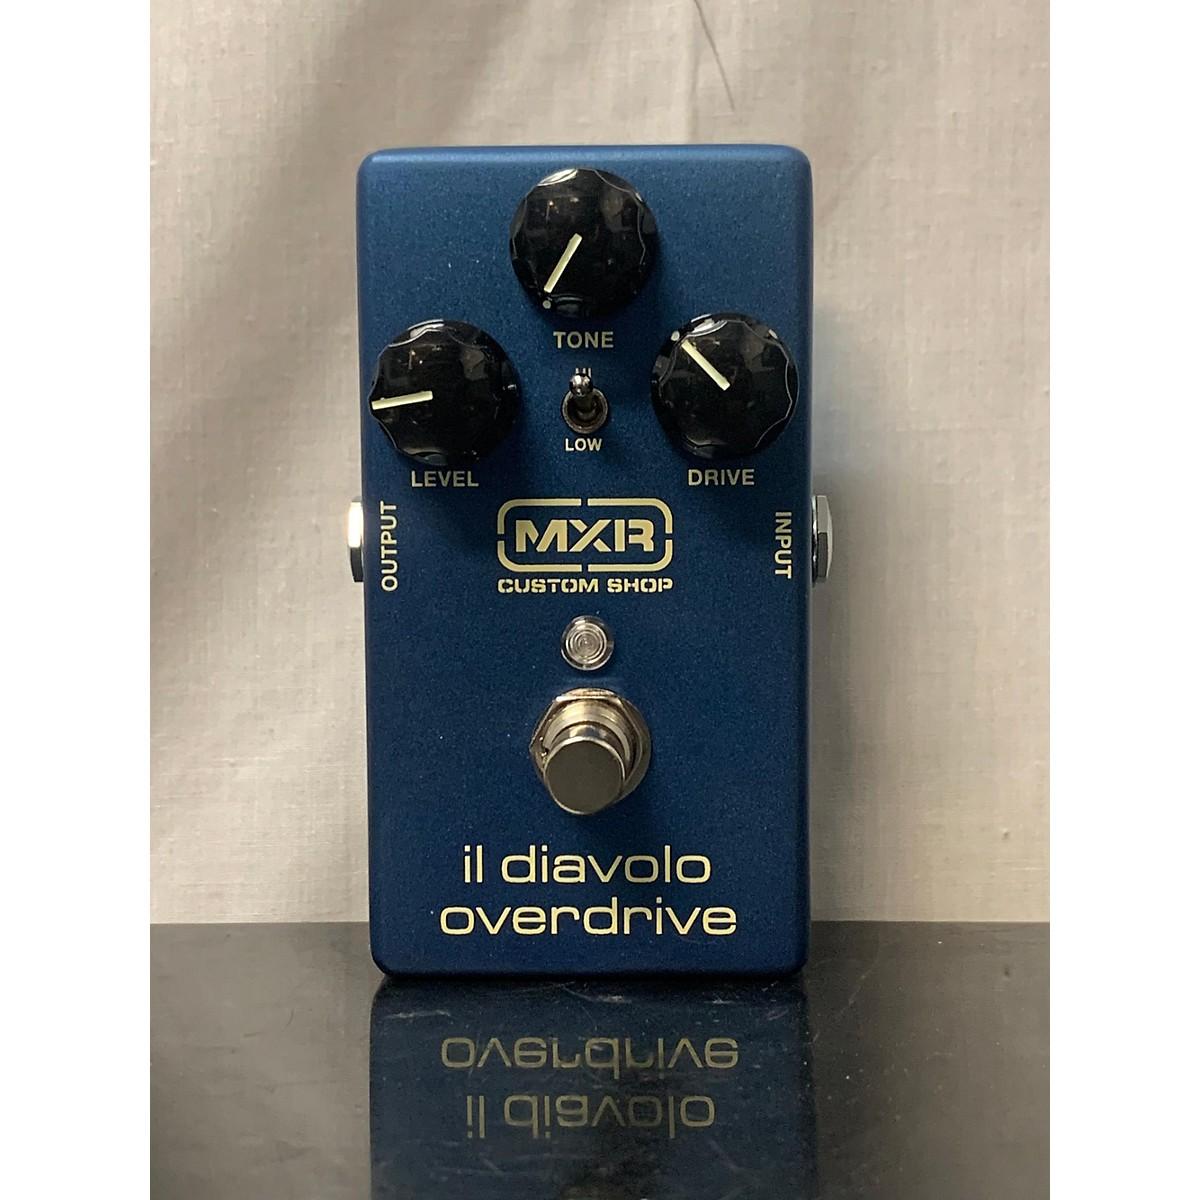 MXR CSP036 IL DIAVOLO OVERDRIVE Effect Pedal